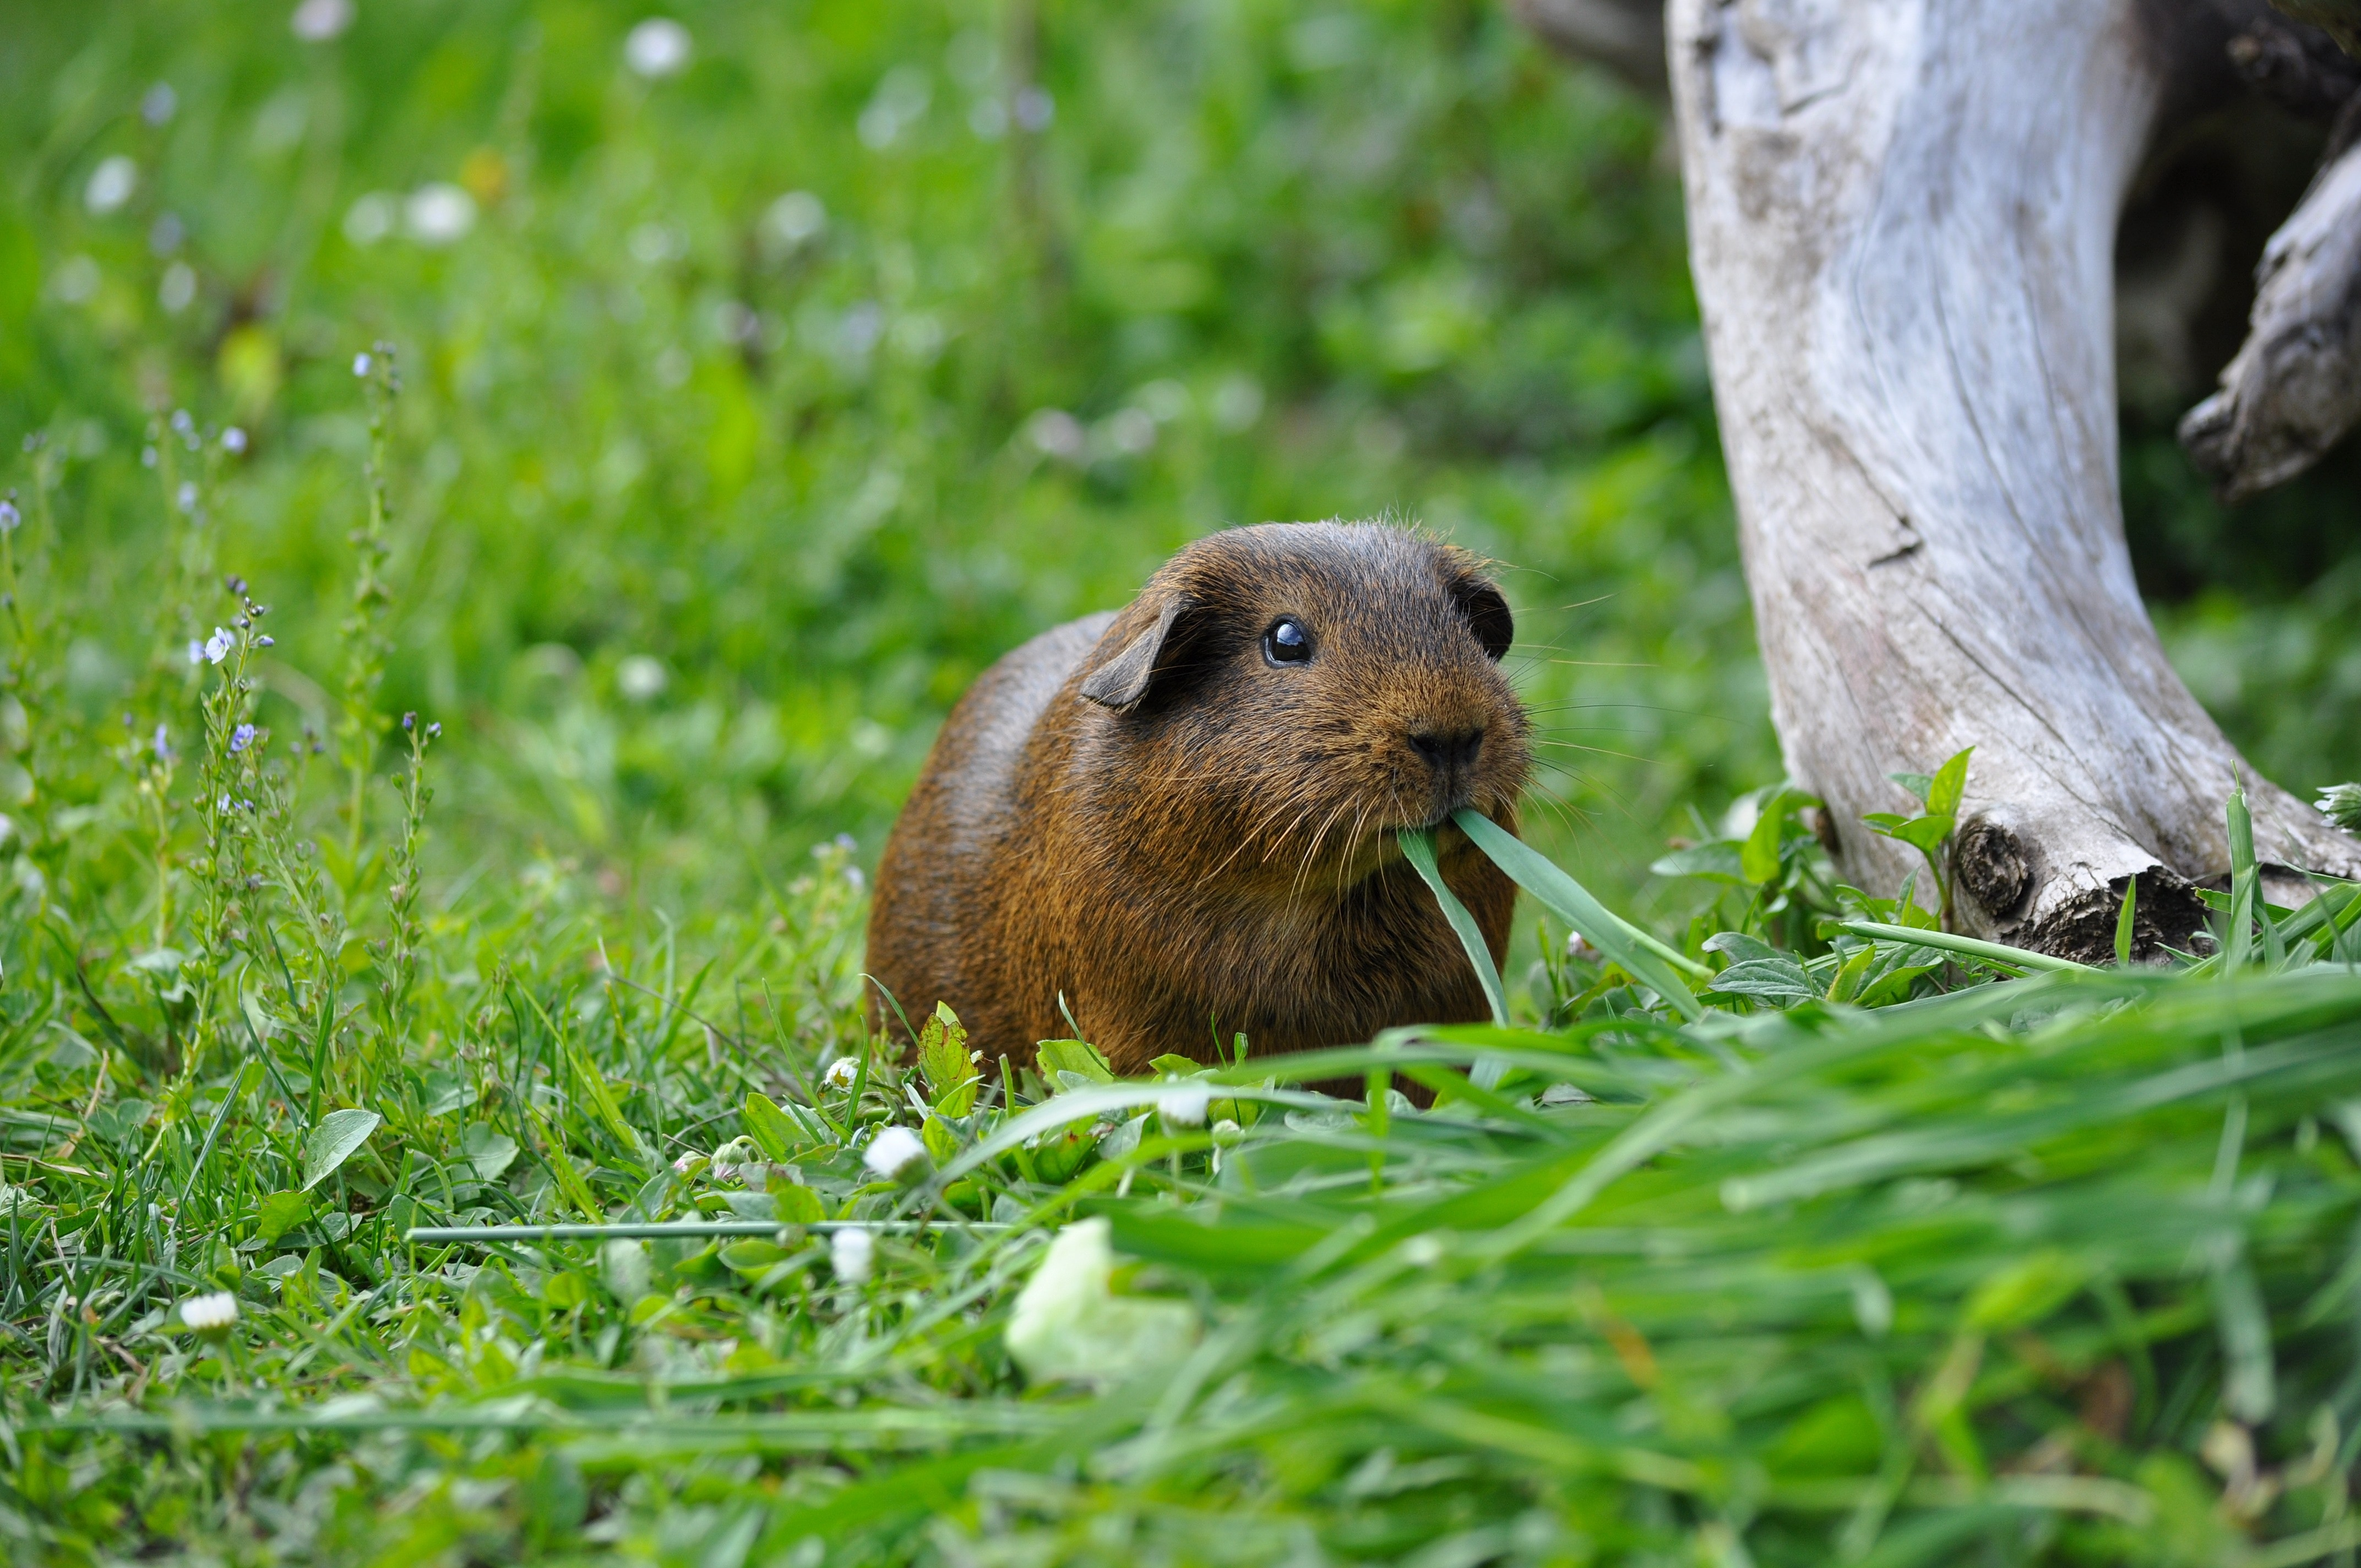 Cute Guinea, Adorable, Animal, Cute, Friend, HQ Photo